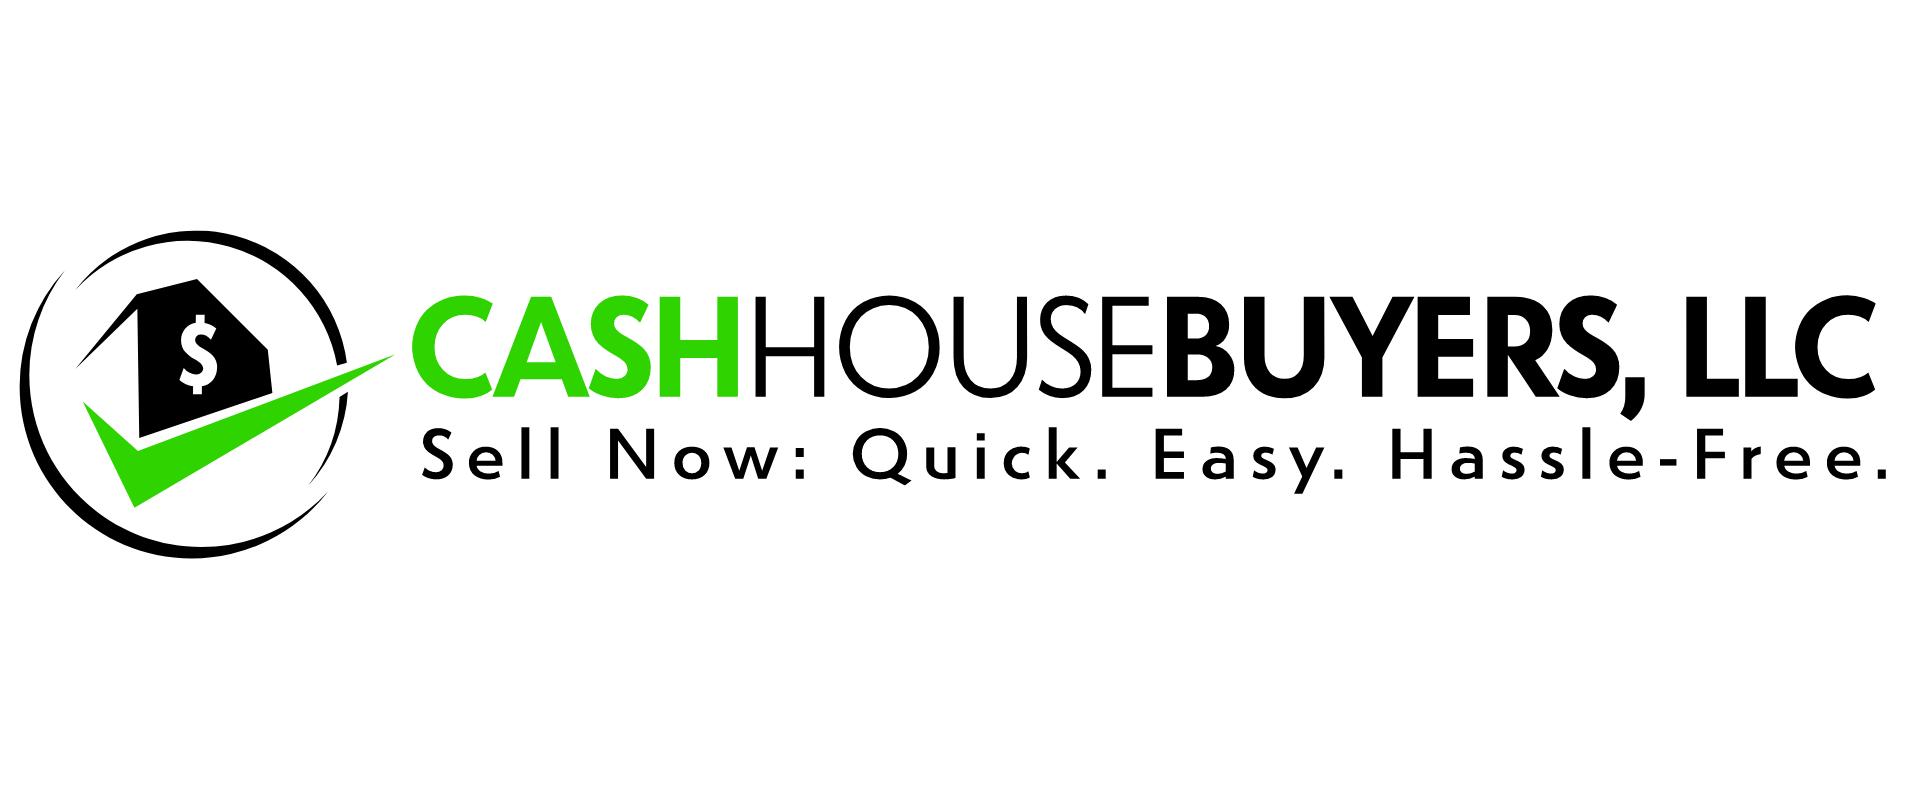 Cash House Buyers, LLC logo